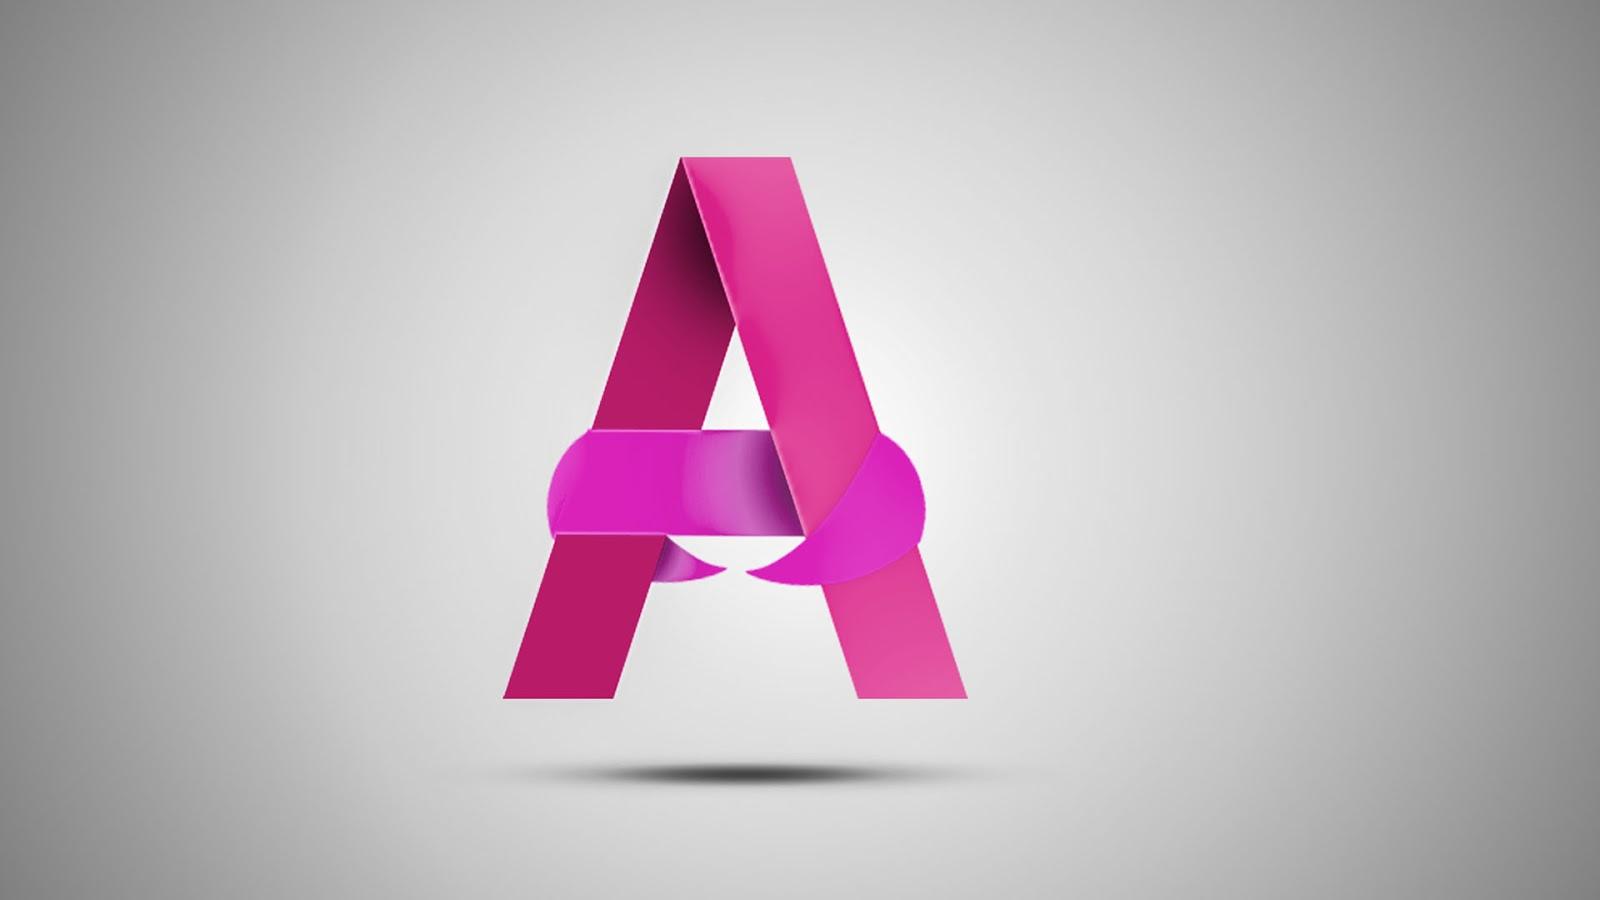 Photoshop logo design tutorial vaxdan for Design lago